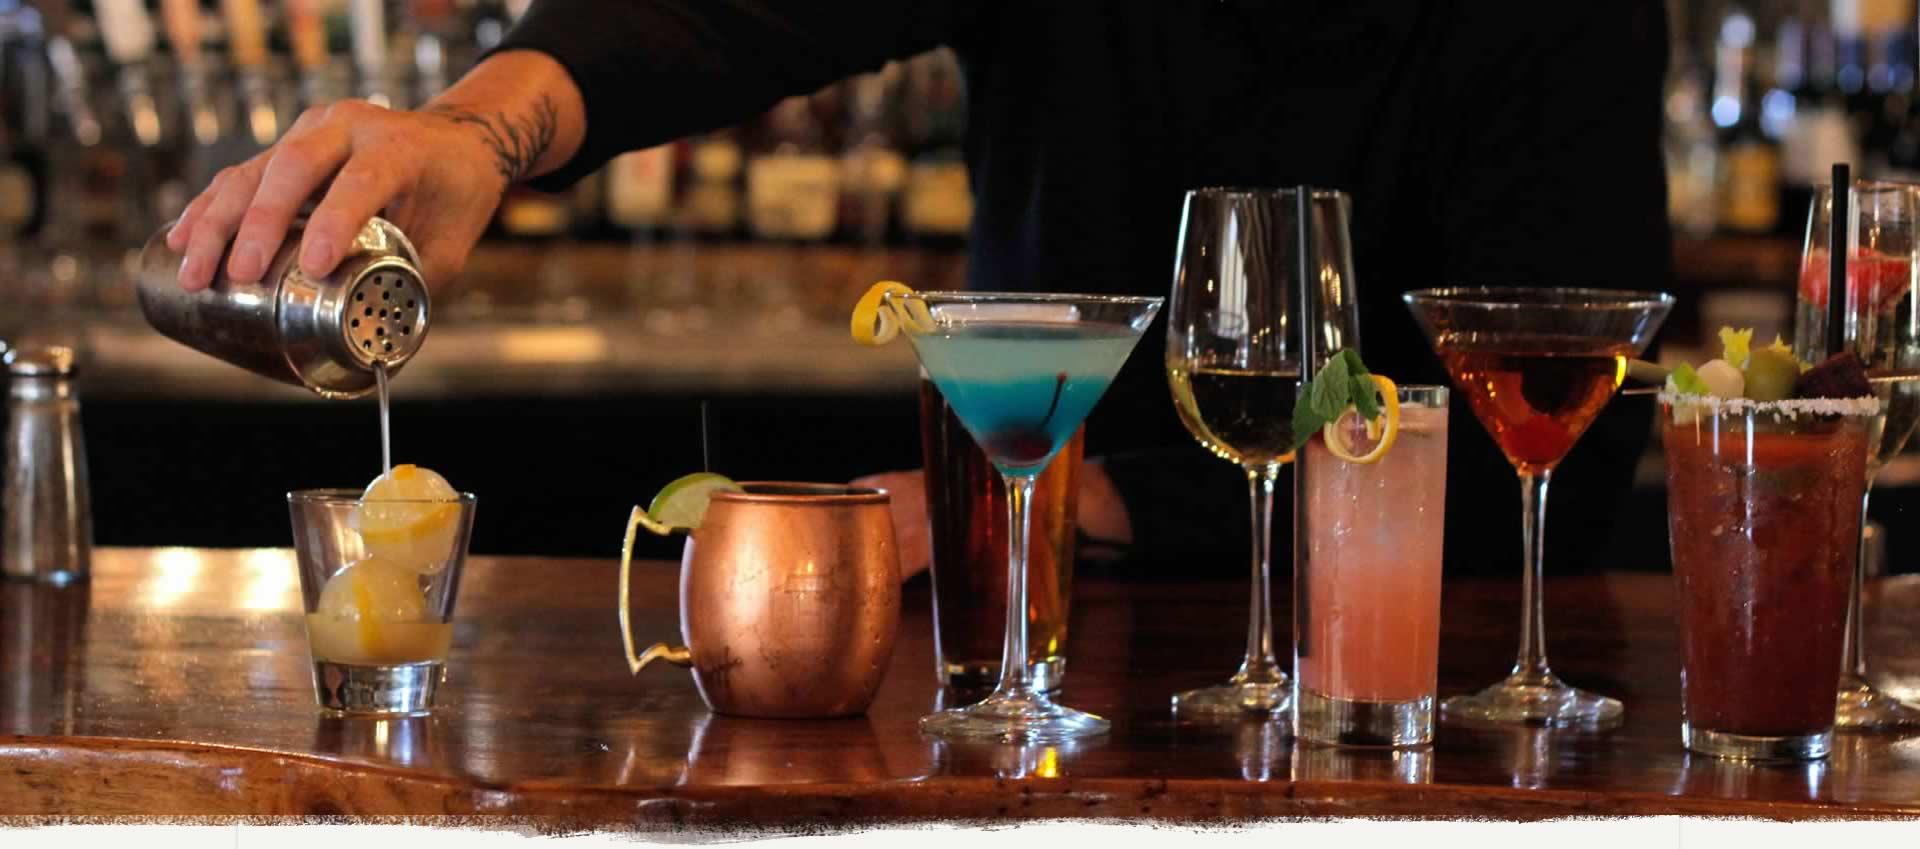 Highlands-resort-drinks-1